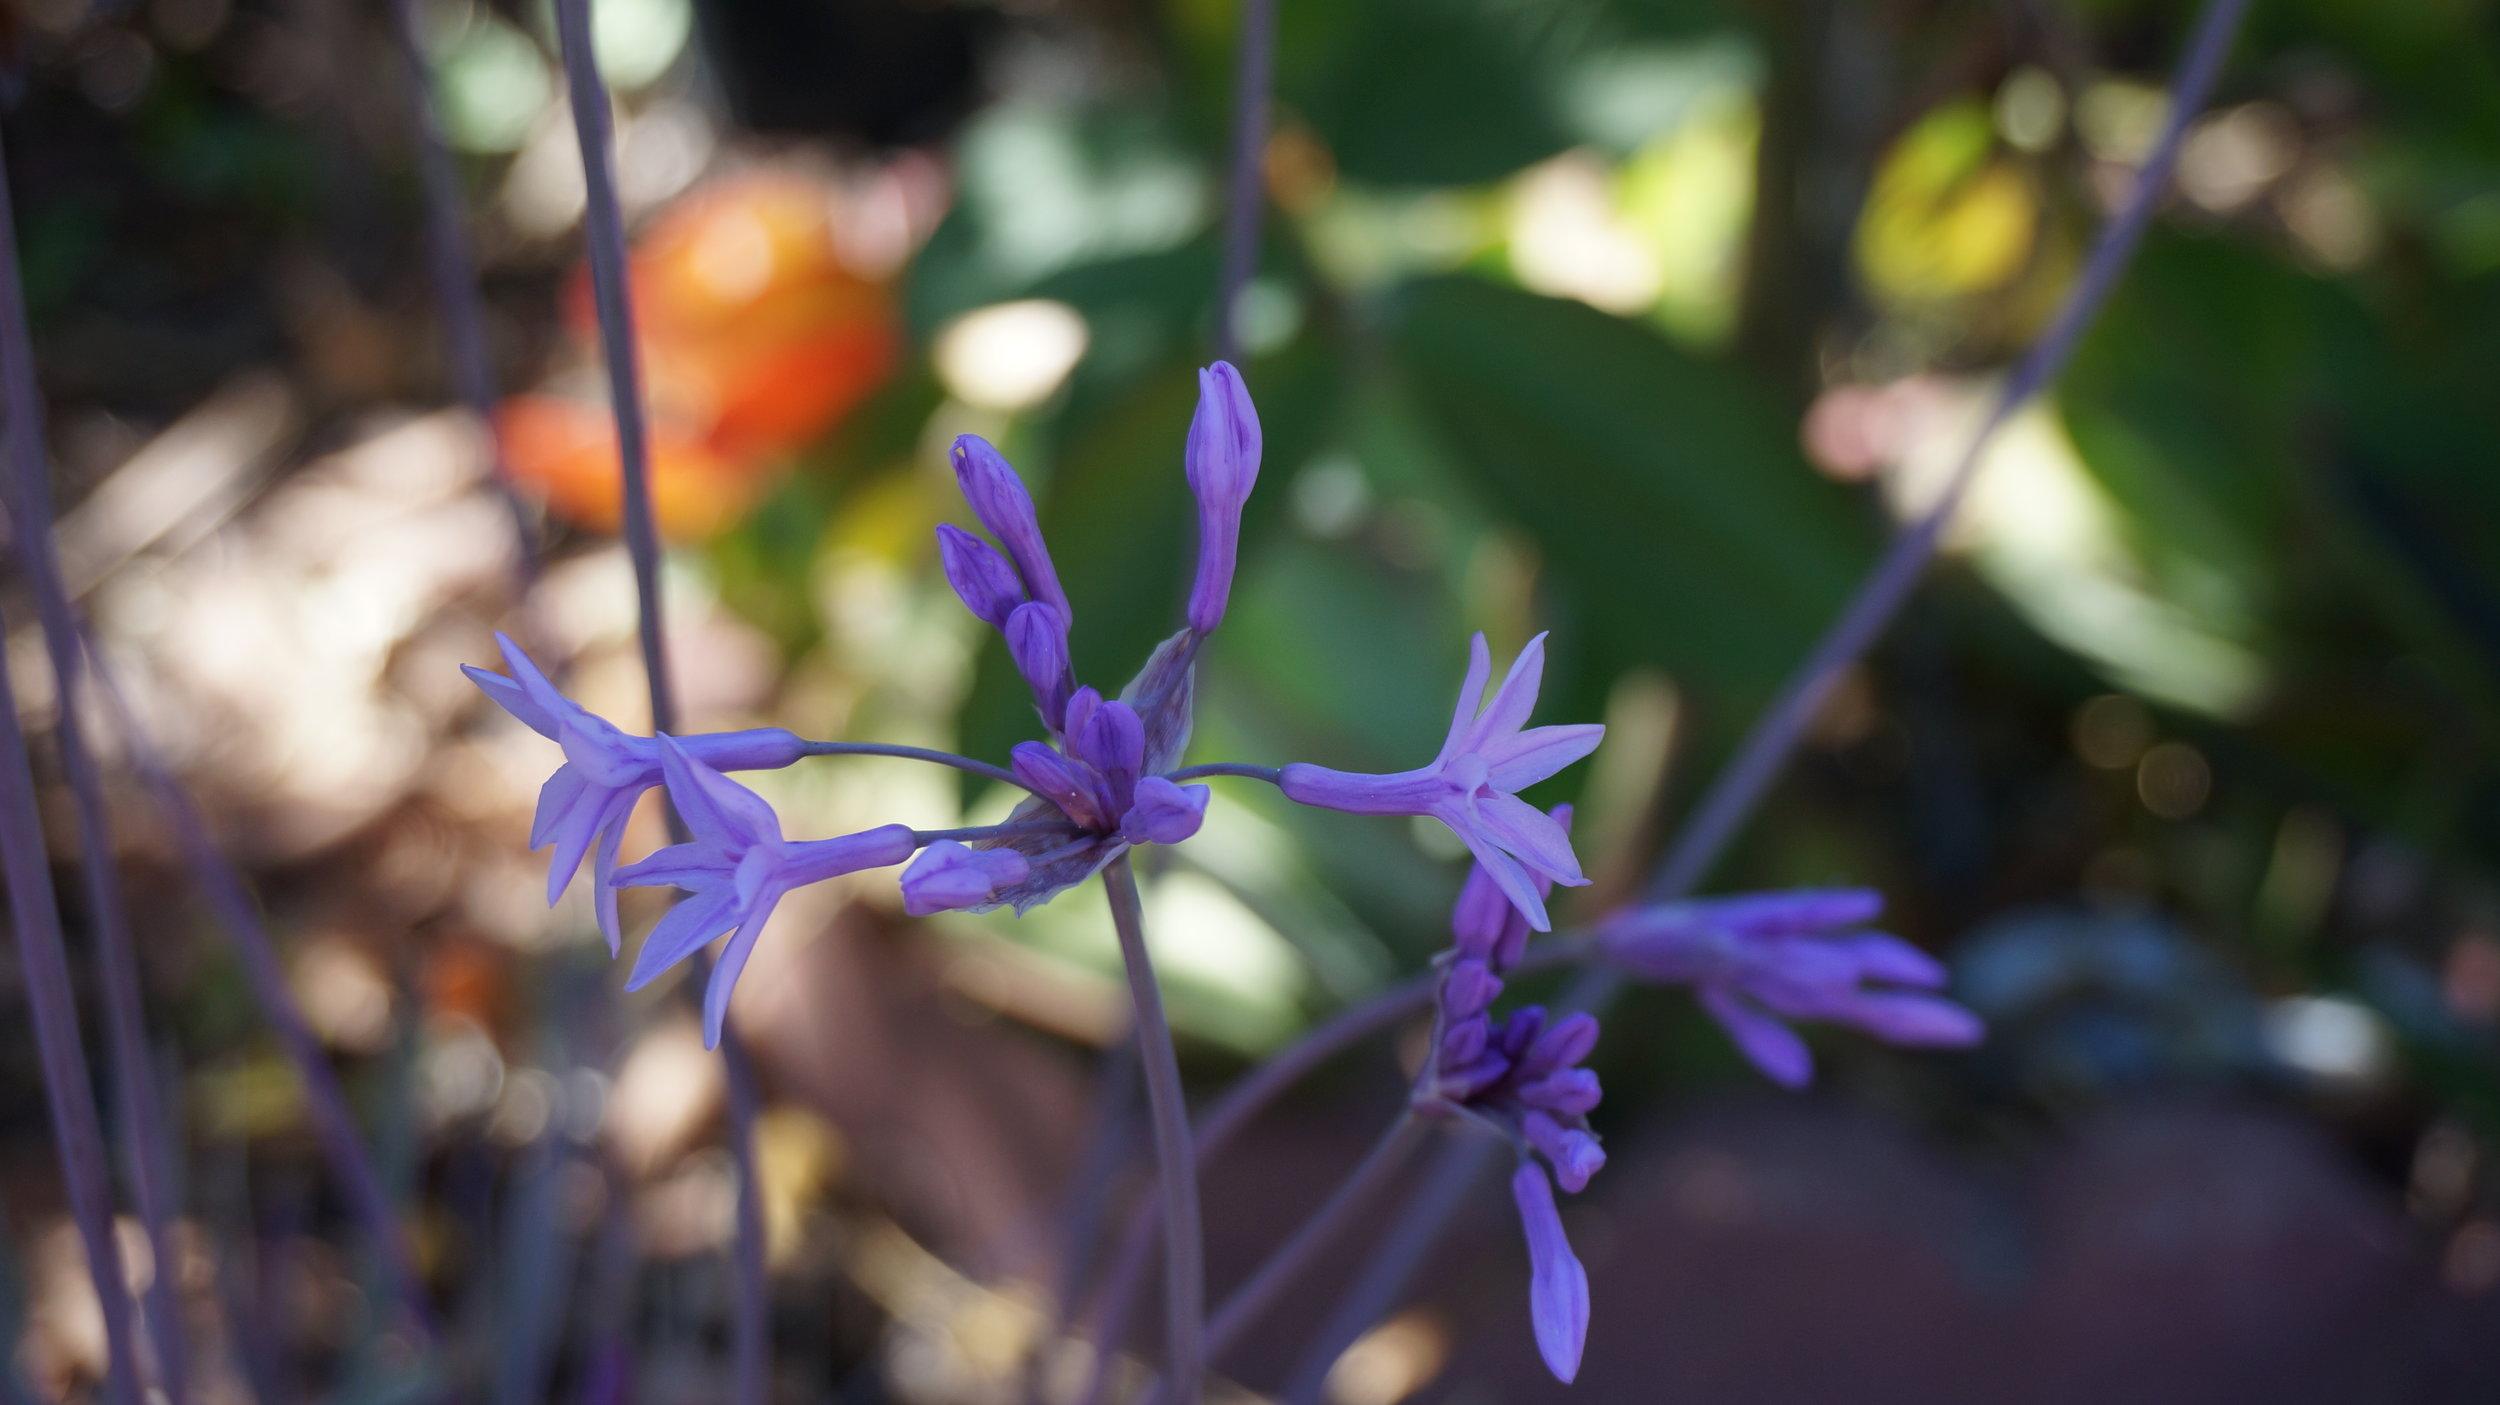 purplelittleflower.jpg